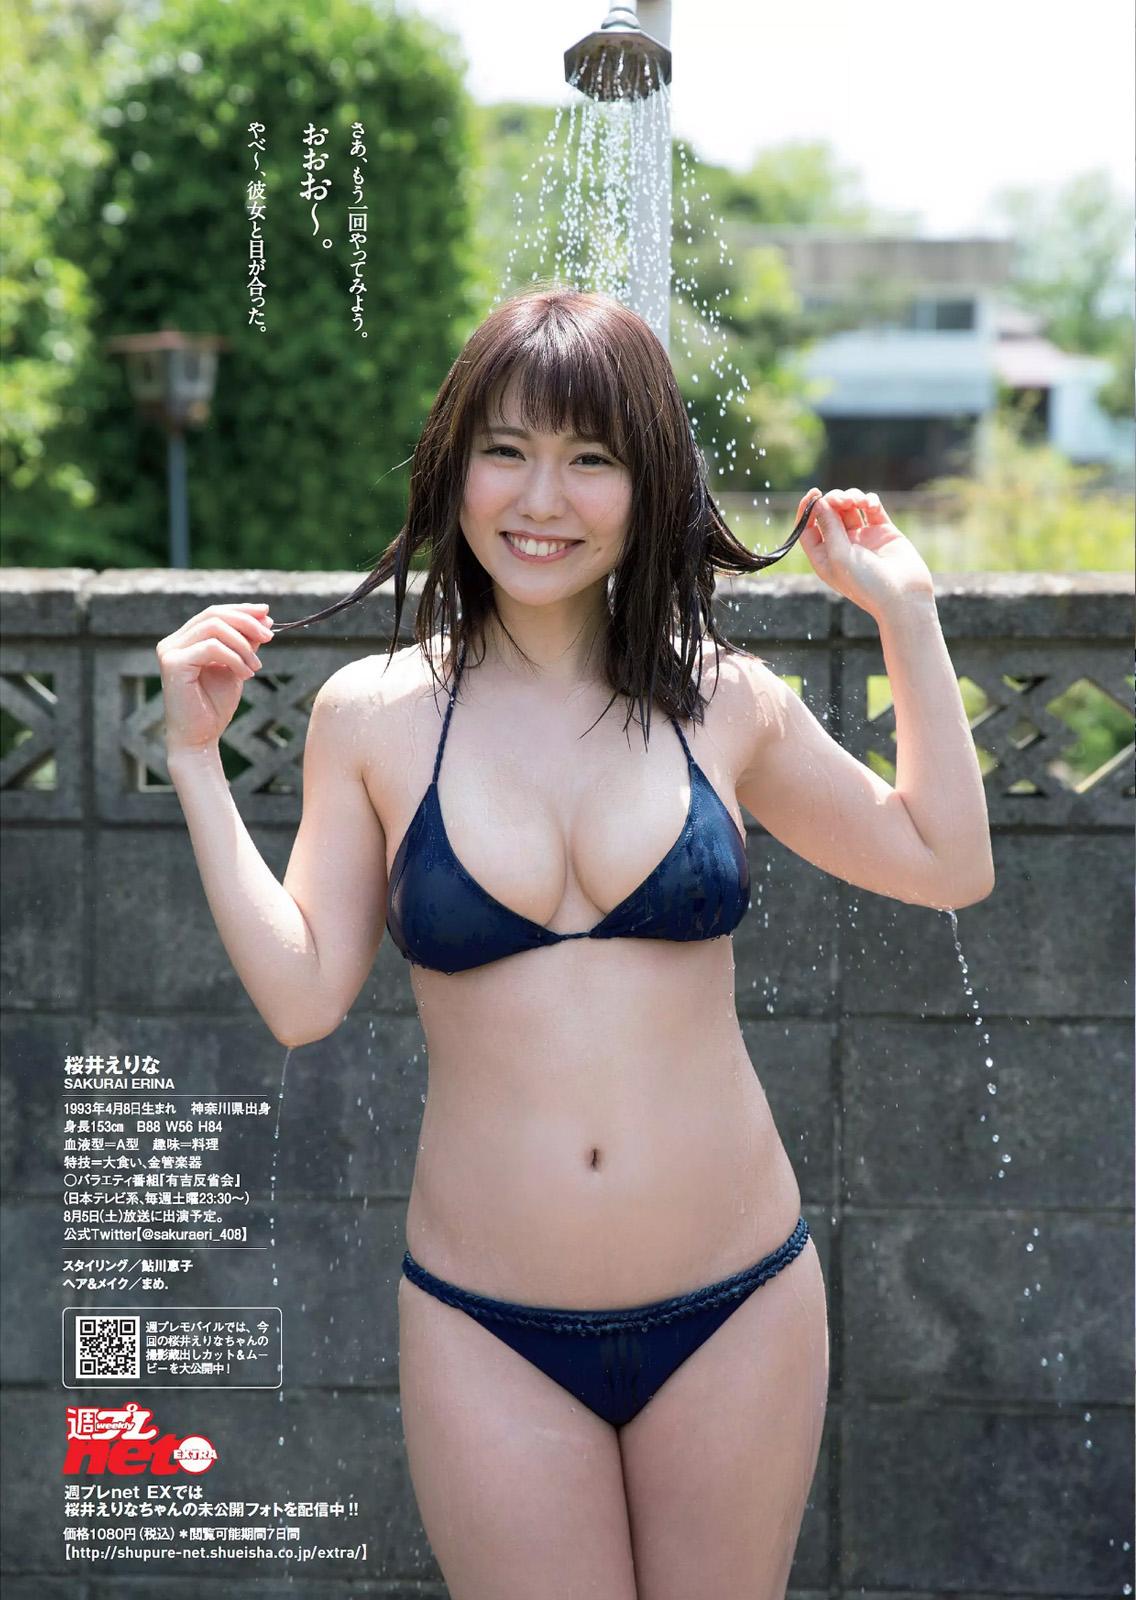 Sakurai Erina 桜井えりな, Shukan Playboy 2017 No.33 (週刊プレイボーイ 2017年33号)